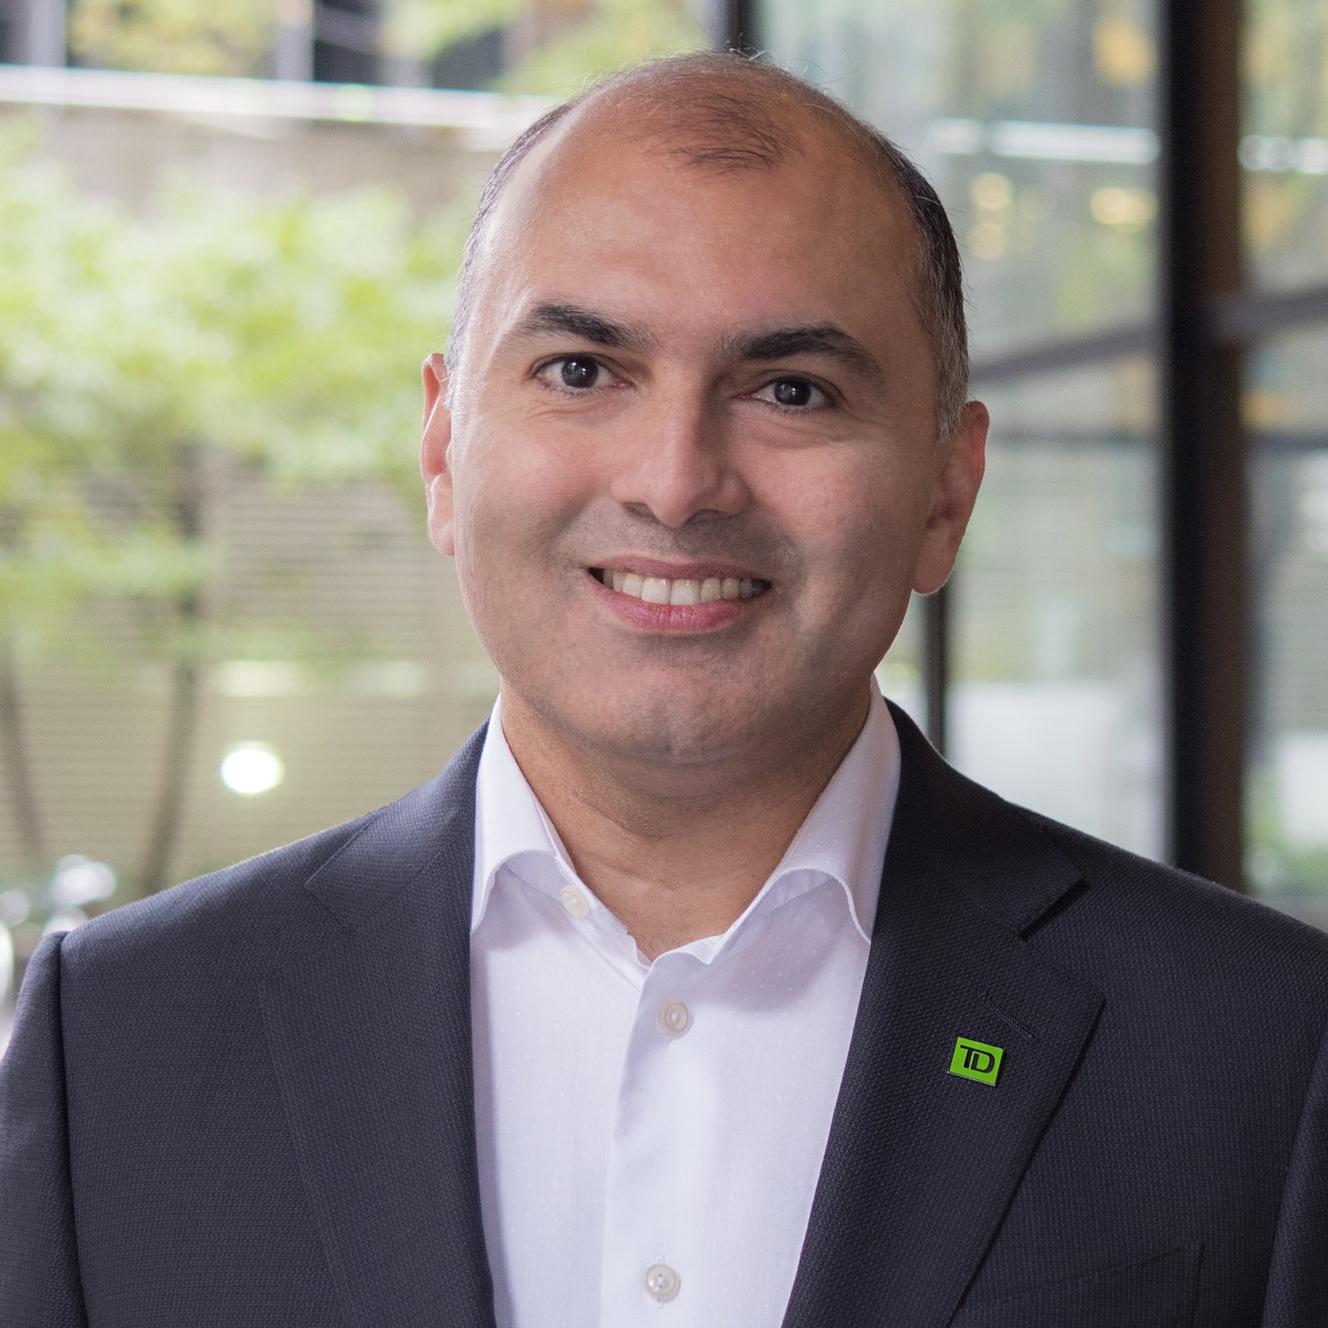 Rizwan Khalfan - EVP, Chief Digital and Payments Officer atTD Bank Group